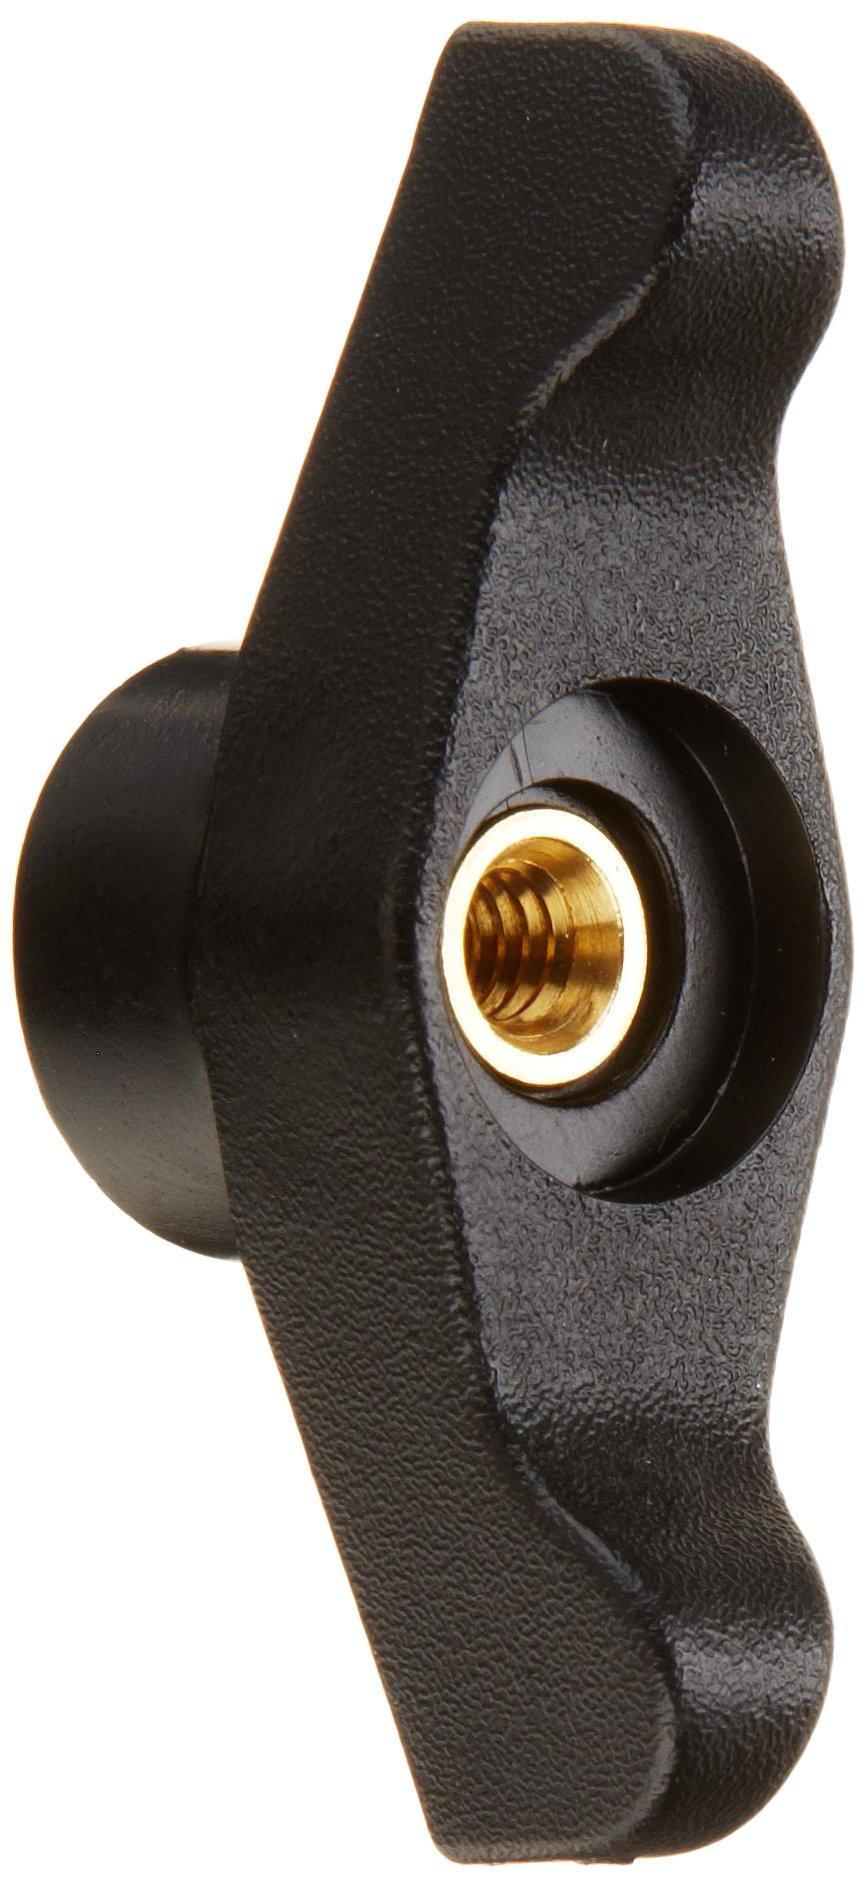 DimcoGray Black Thermoplastic Wingnut Knob Female, Thru Hole Brass Insert: 1/4-20'' Thread x 5/8'' Depth, 2-1/2'' Diameter x 1-3/64'' Height x 7/8'' Hub Dia x 3/8'' Hub Length (Pack of 10)